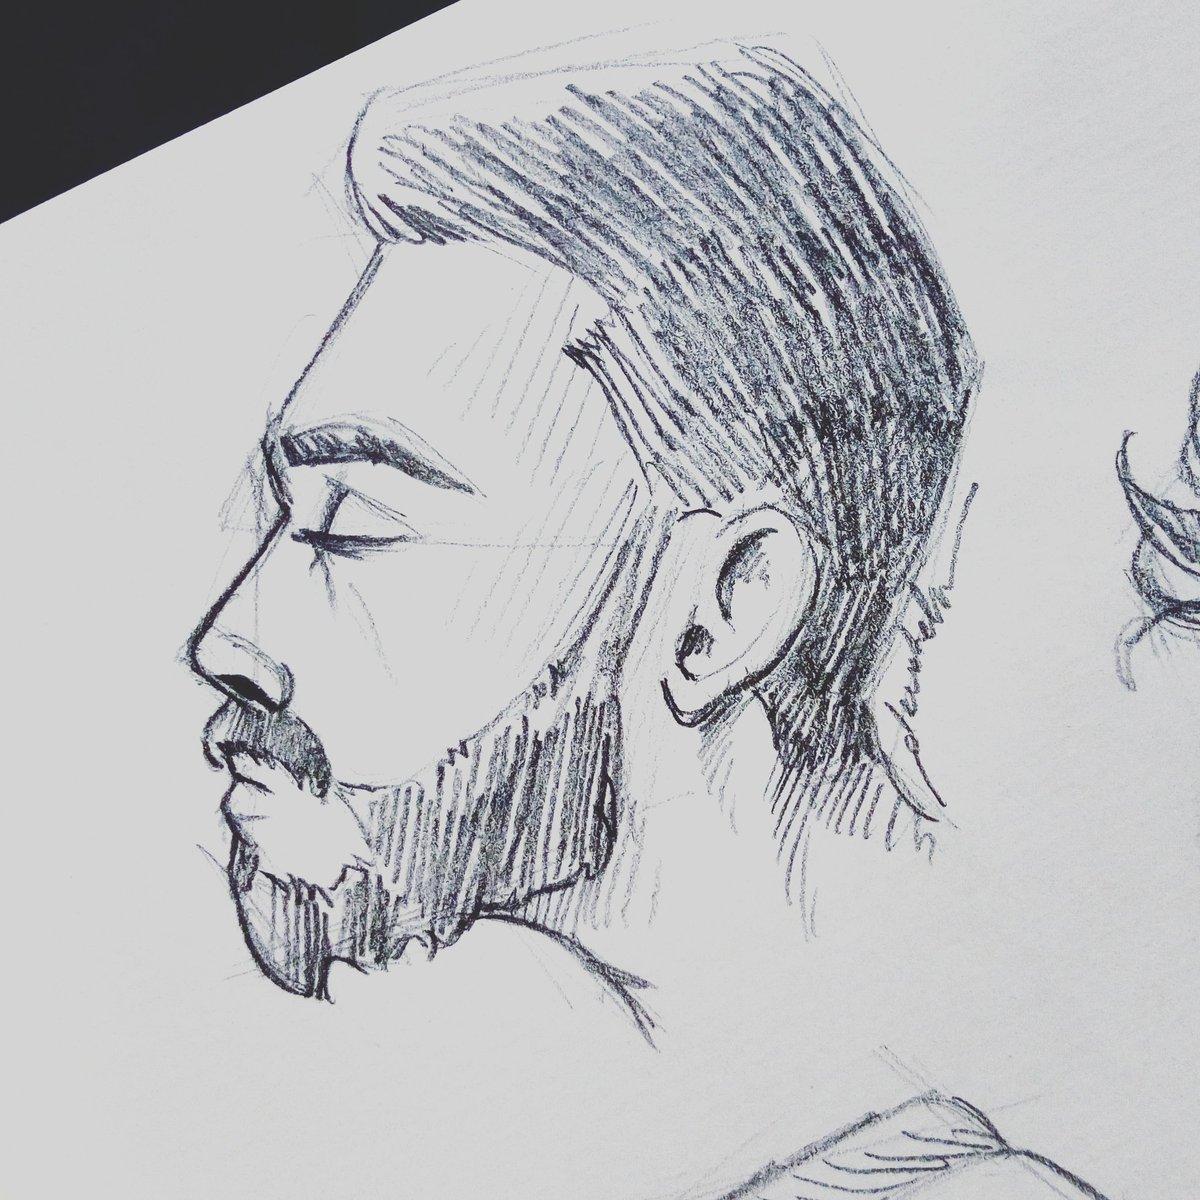 Breathe #dailyart #dailyillustration #pencil #face #portrait #breathe https://t.co/A900SxSqGU